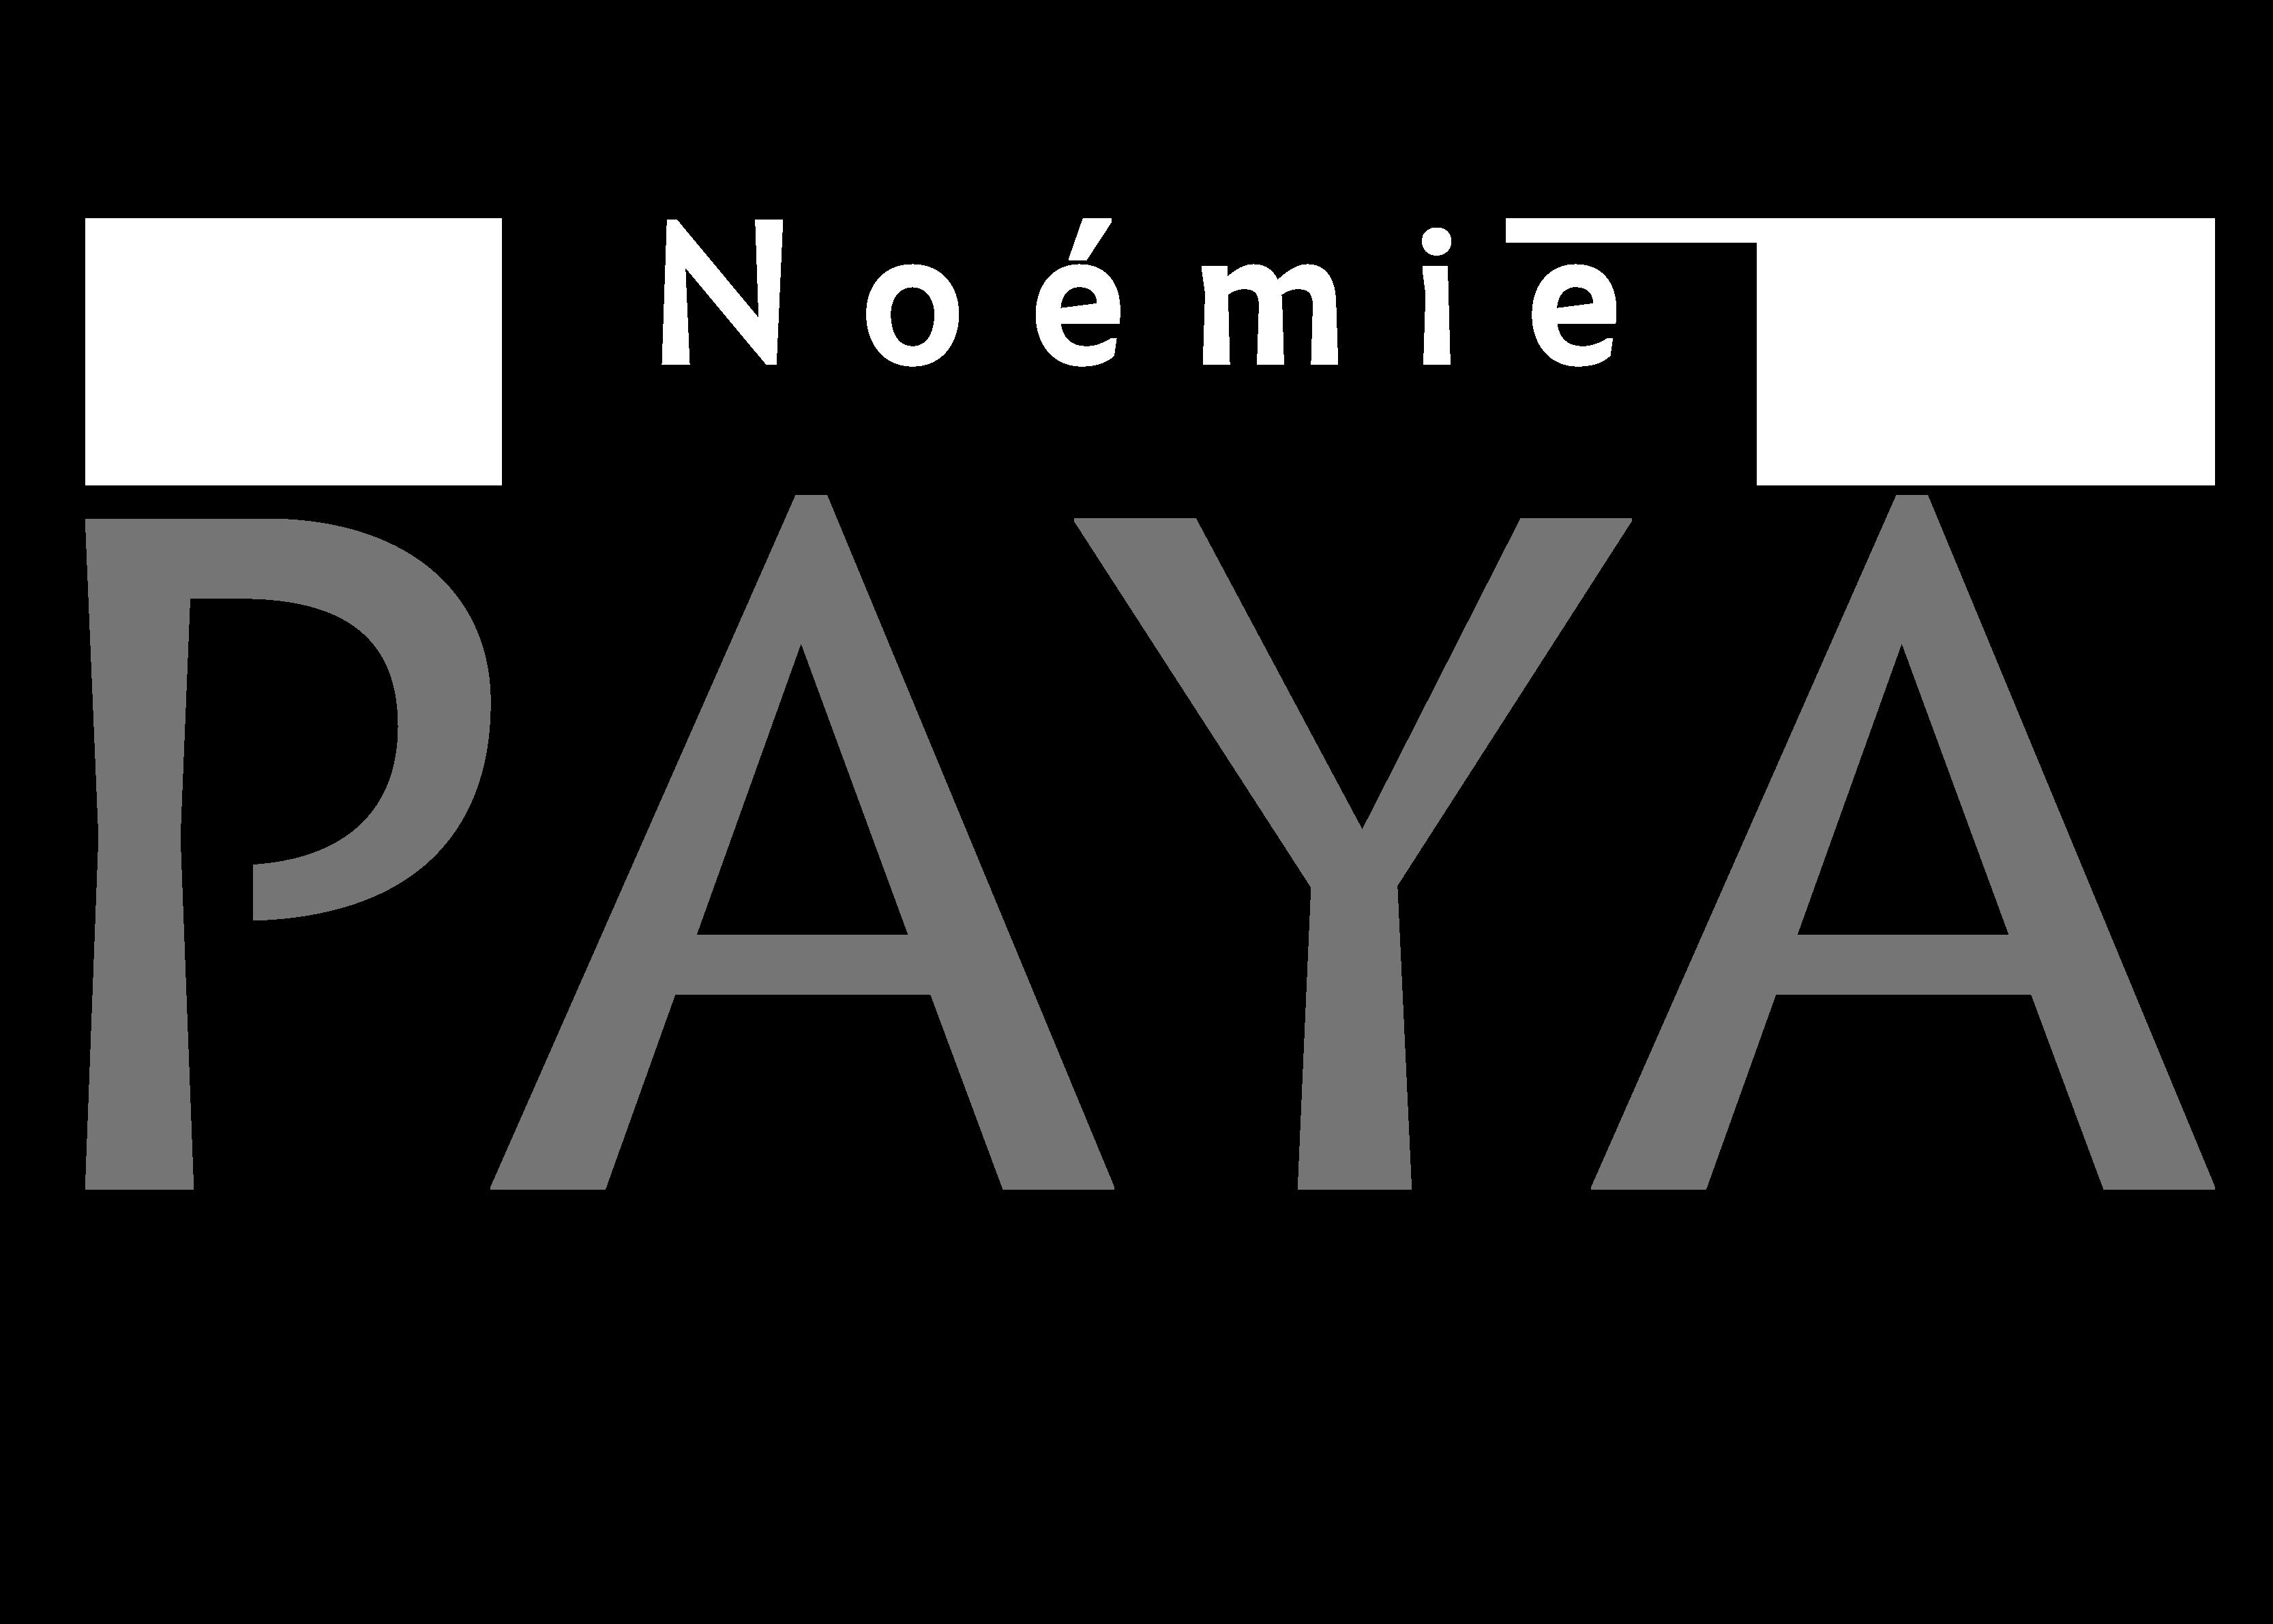 Noémie Paya